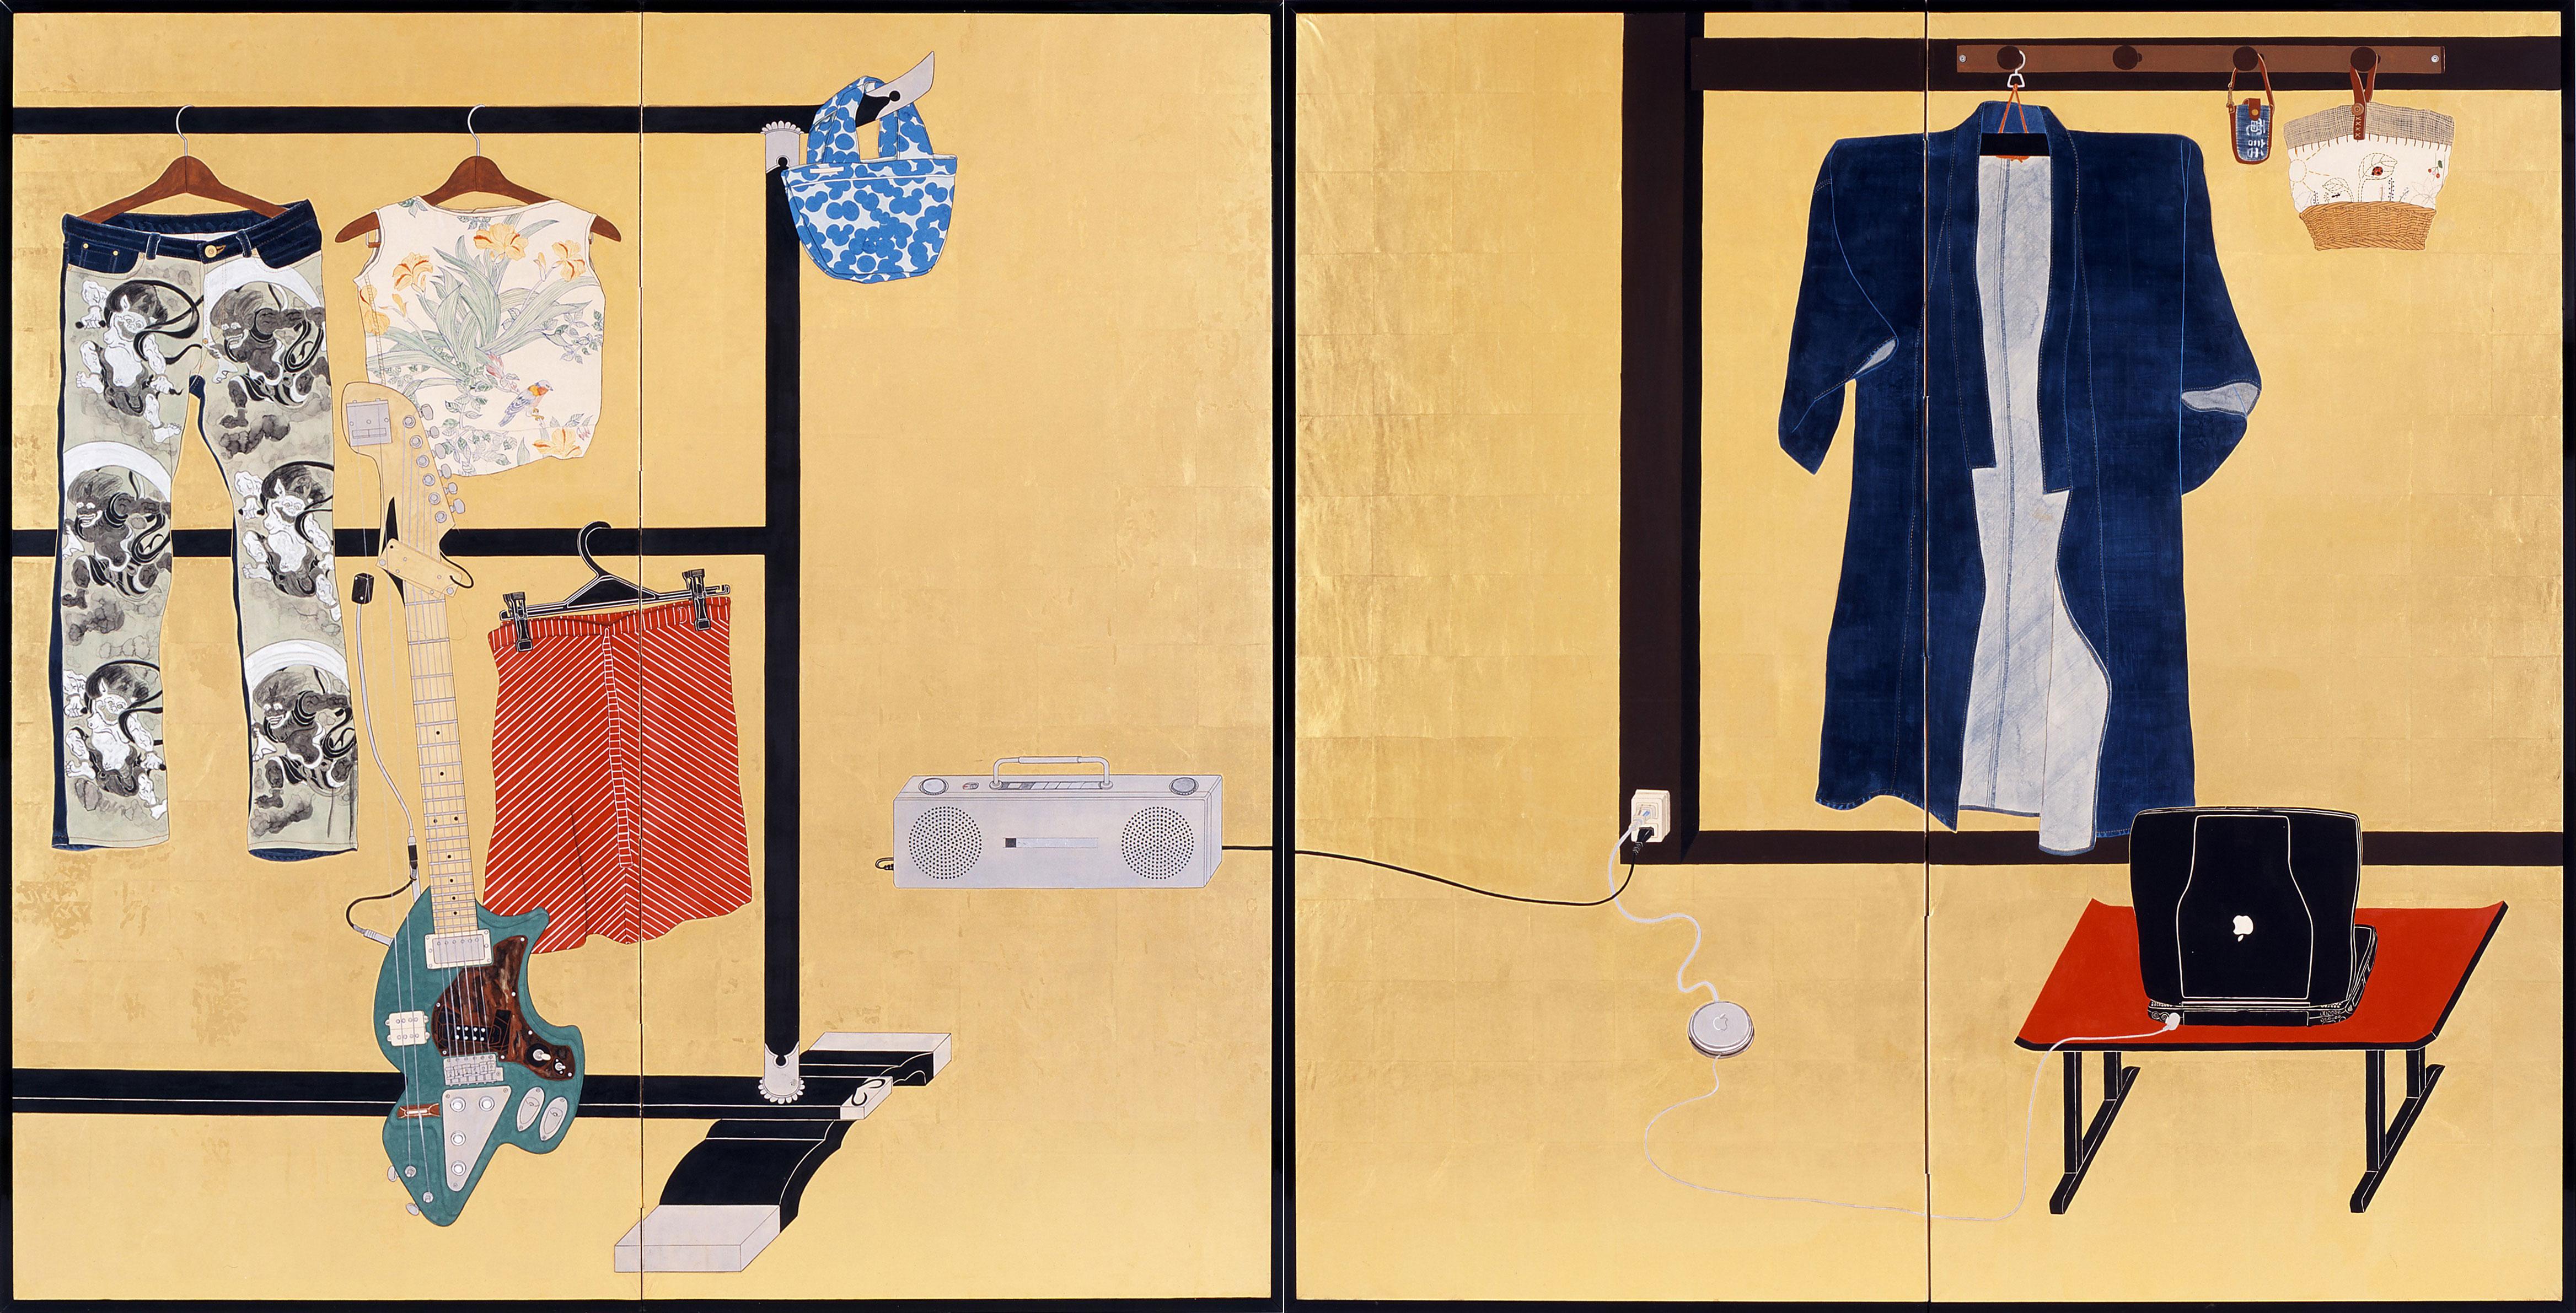 「誰ヶ裾屏風」 2005年制作 二曲一双 各(169×165.6cm) 紙本金地着色 ©️Taro Yamamoto , courtesy of imura art gallery